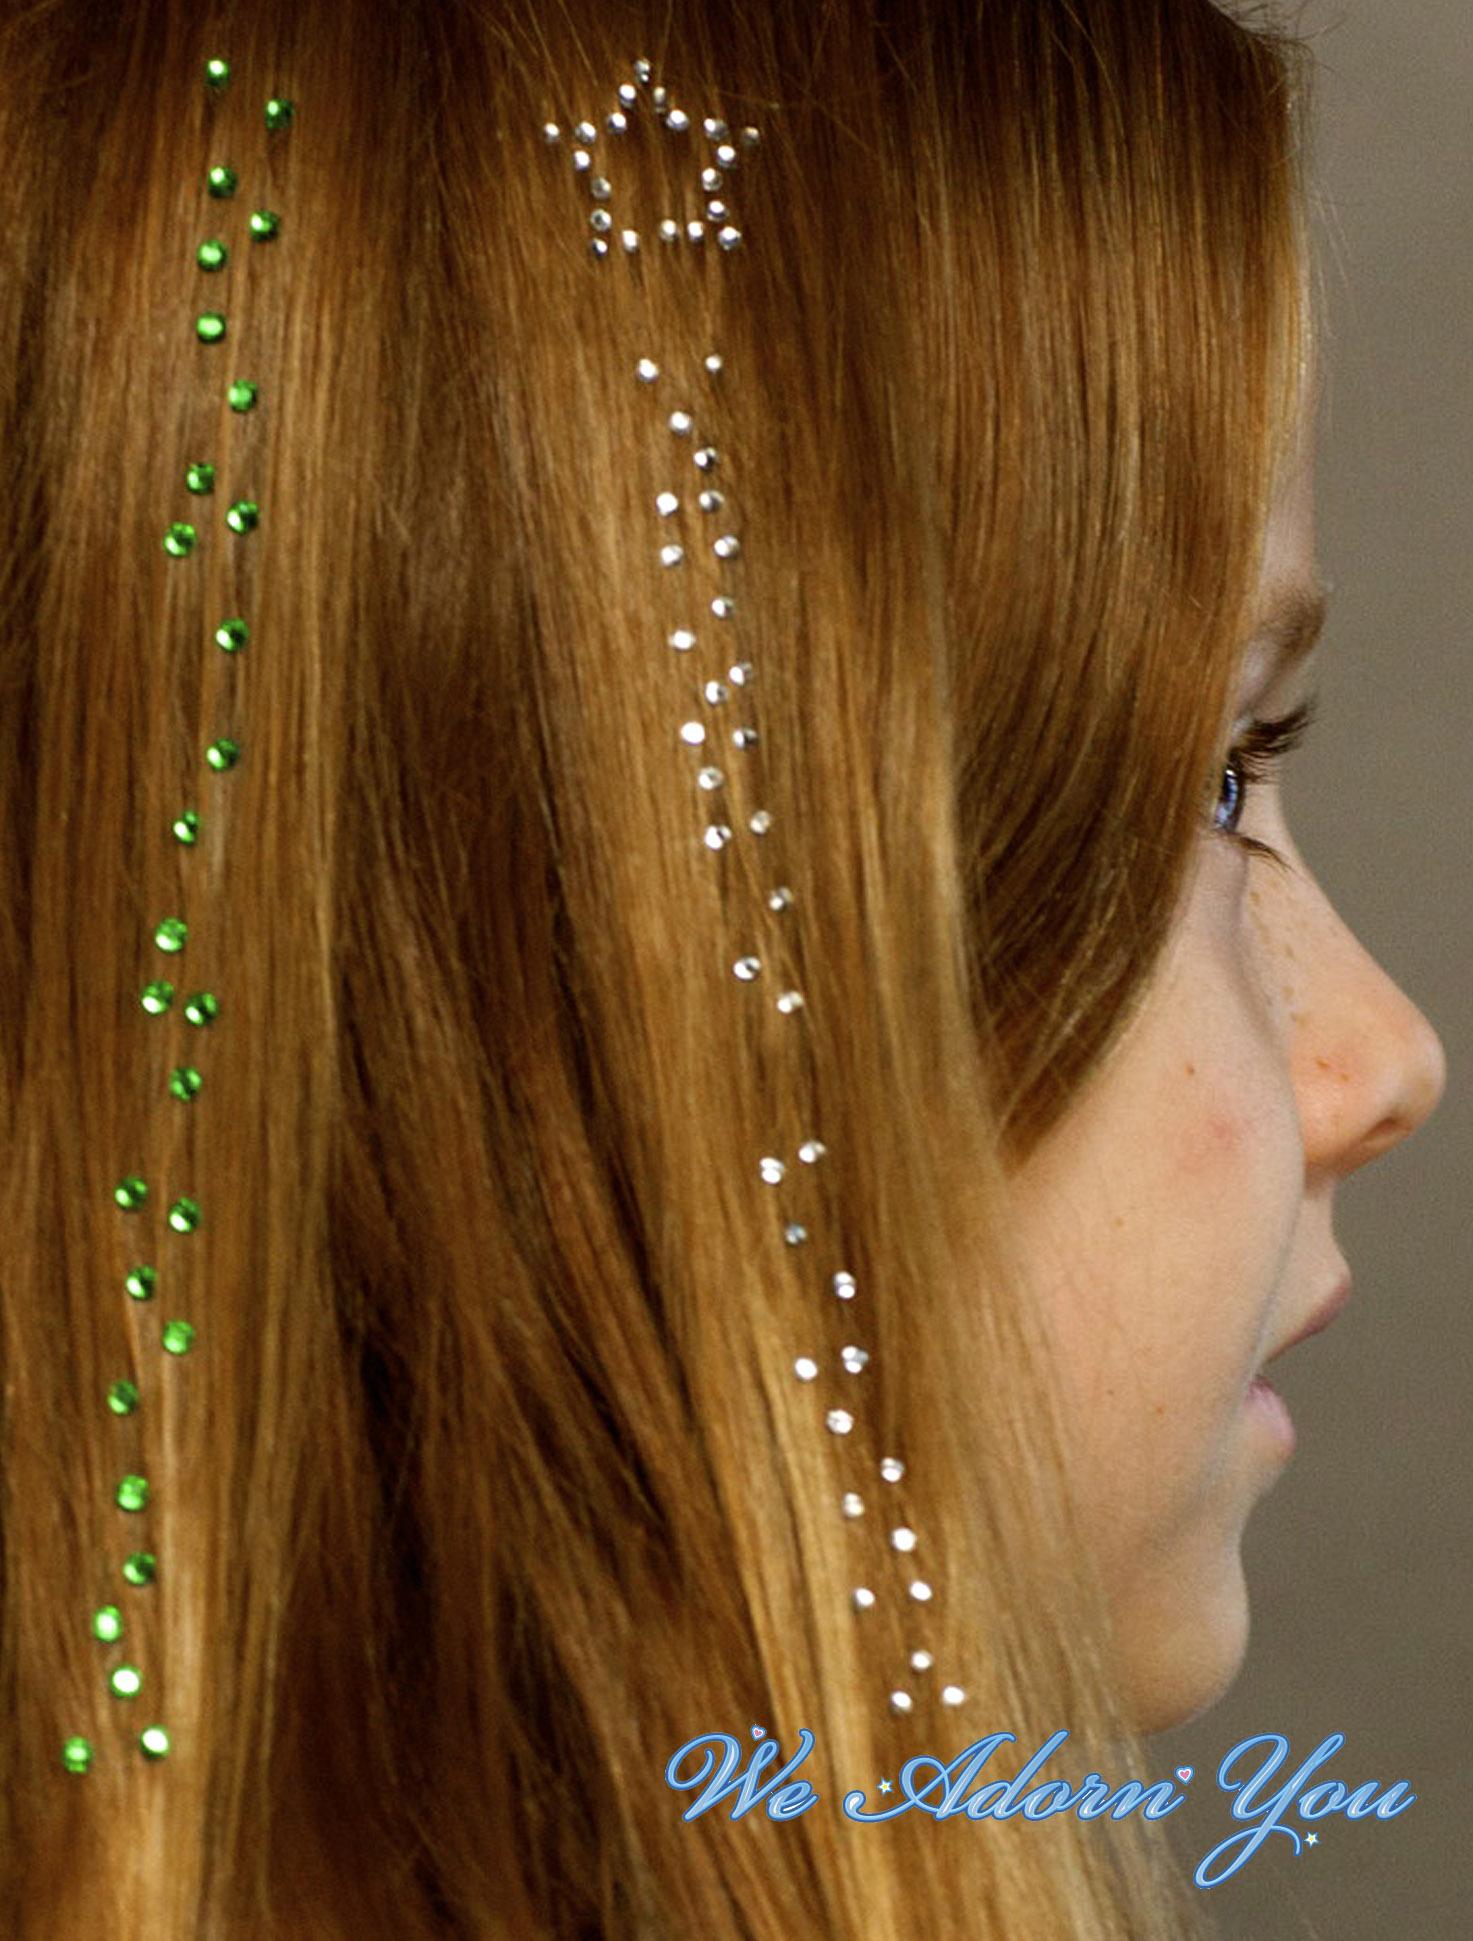 Hair Crystals - We Adorn You.jpg